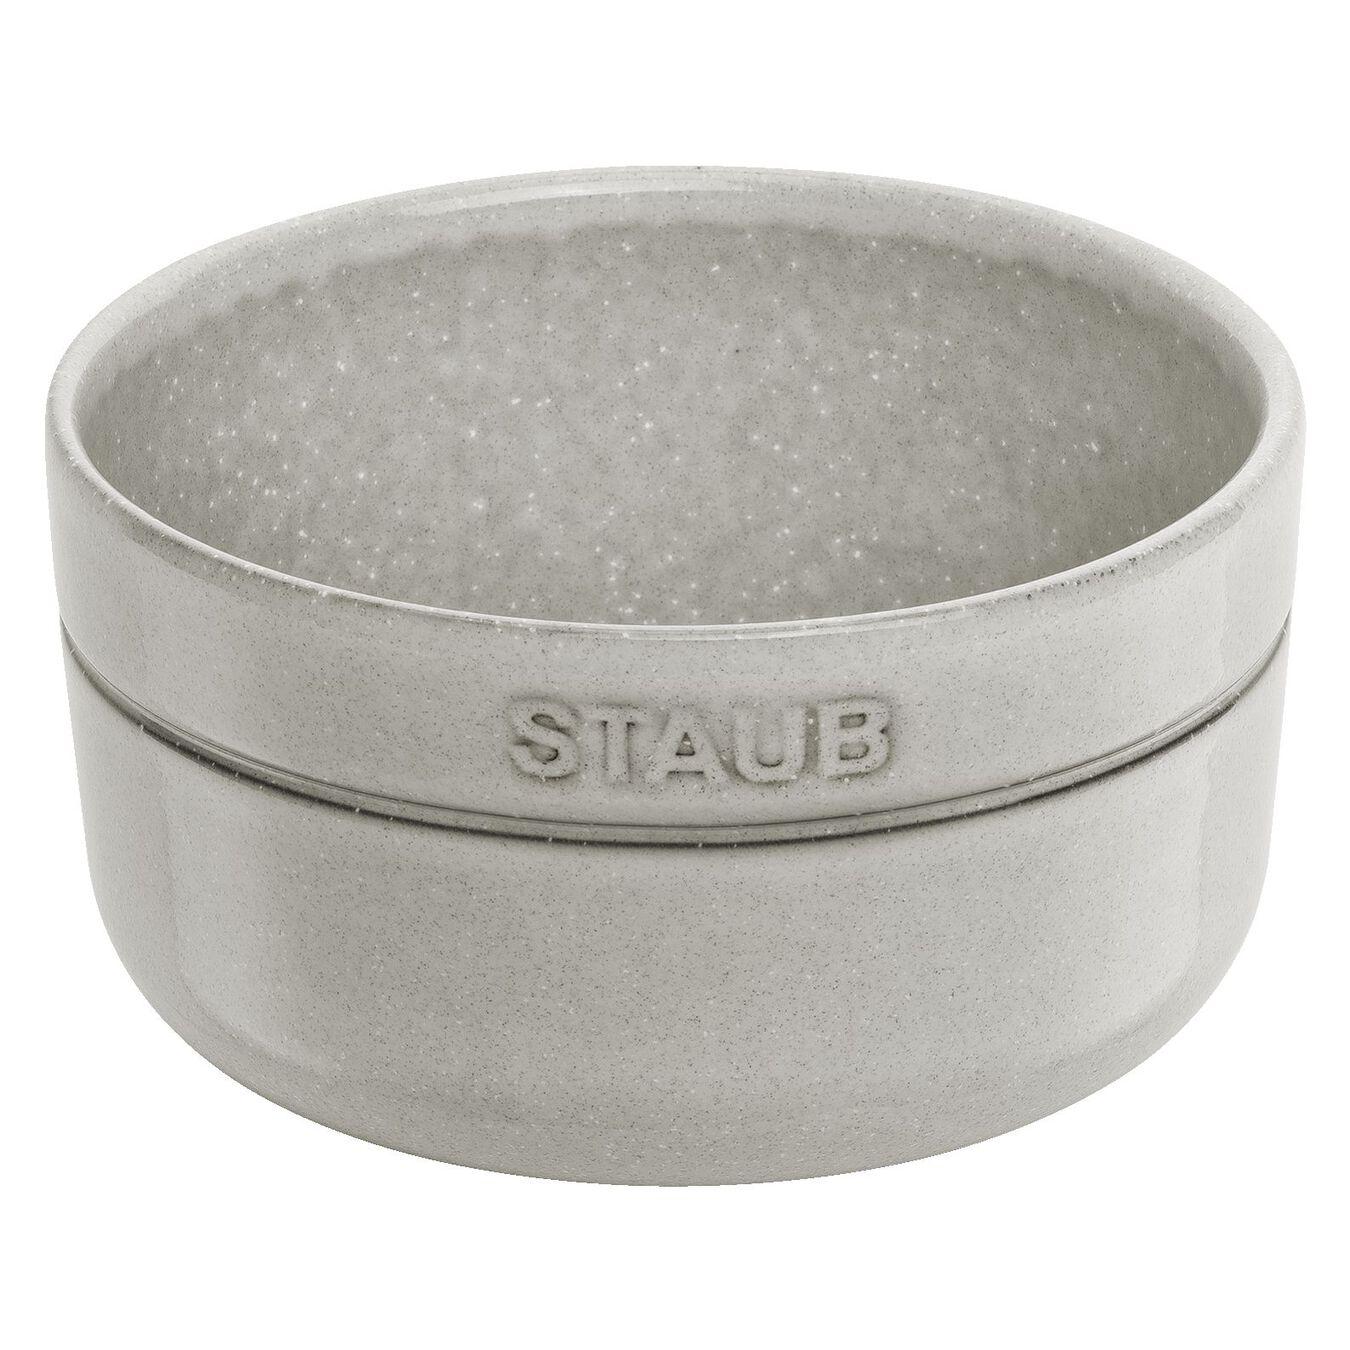 4-pcs Ceramic round Service de bols, White Truffle,,large 1